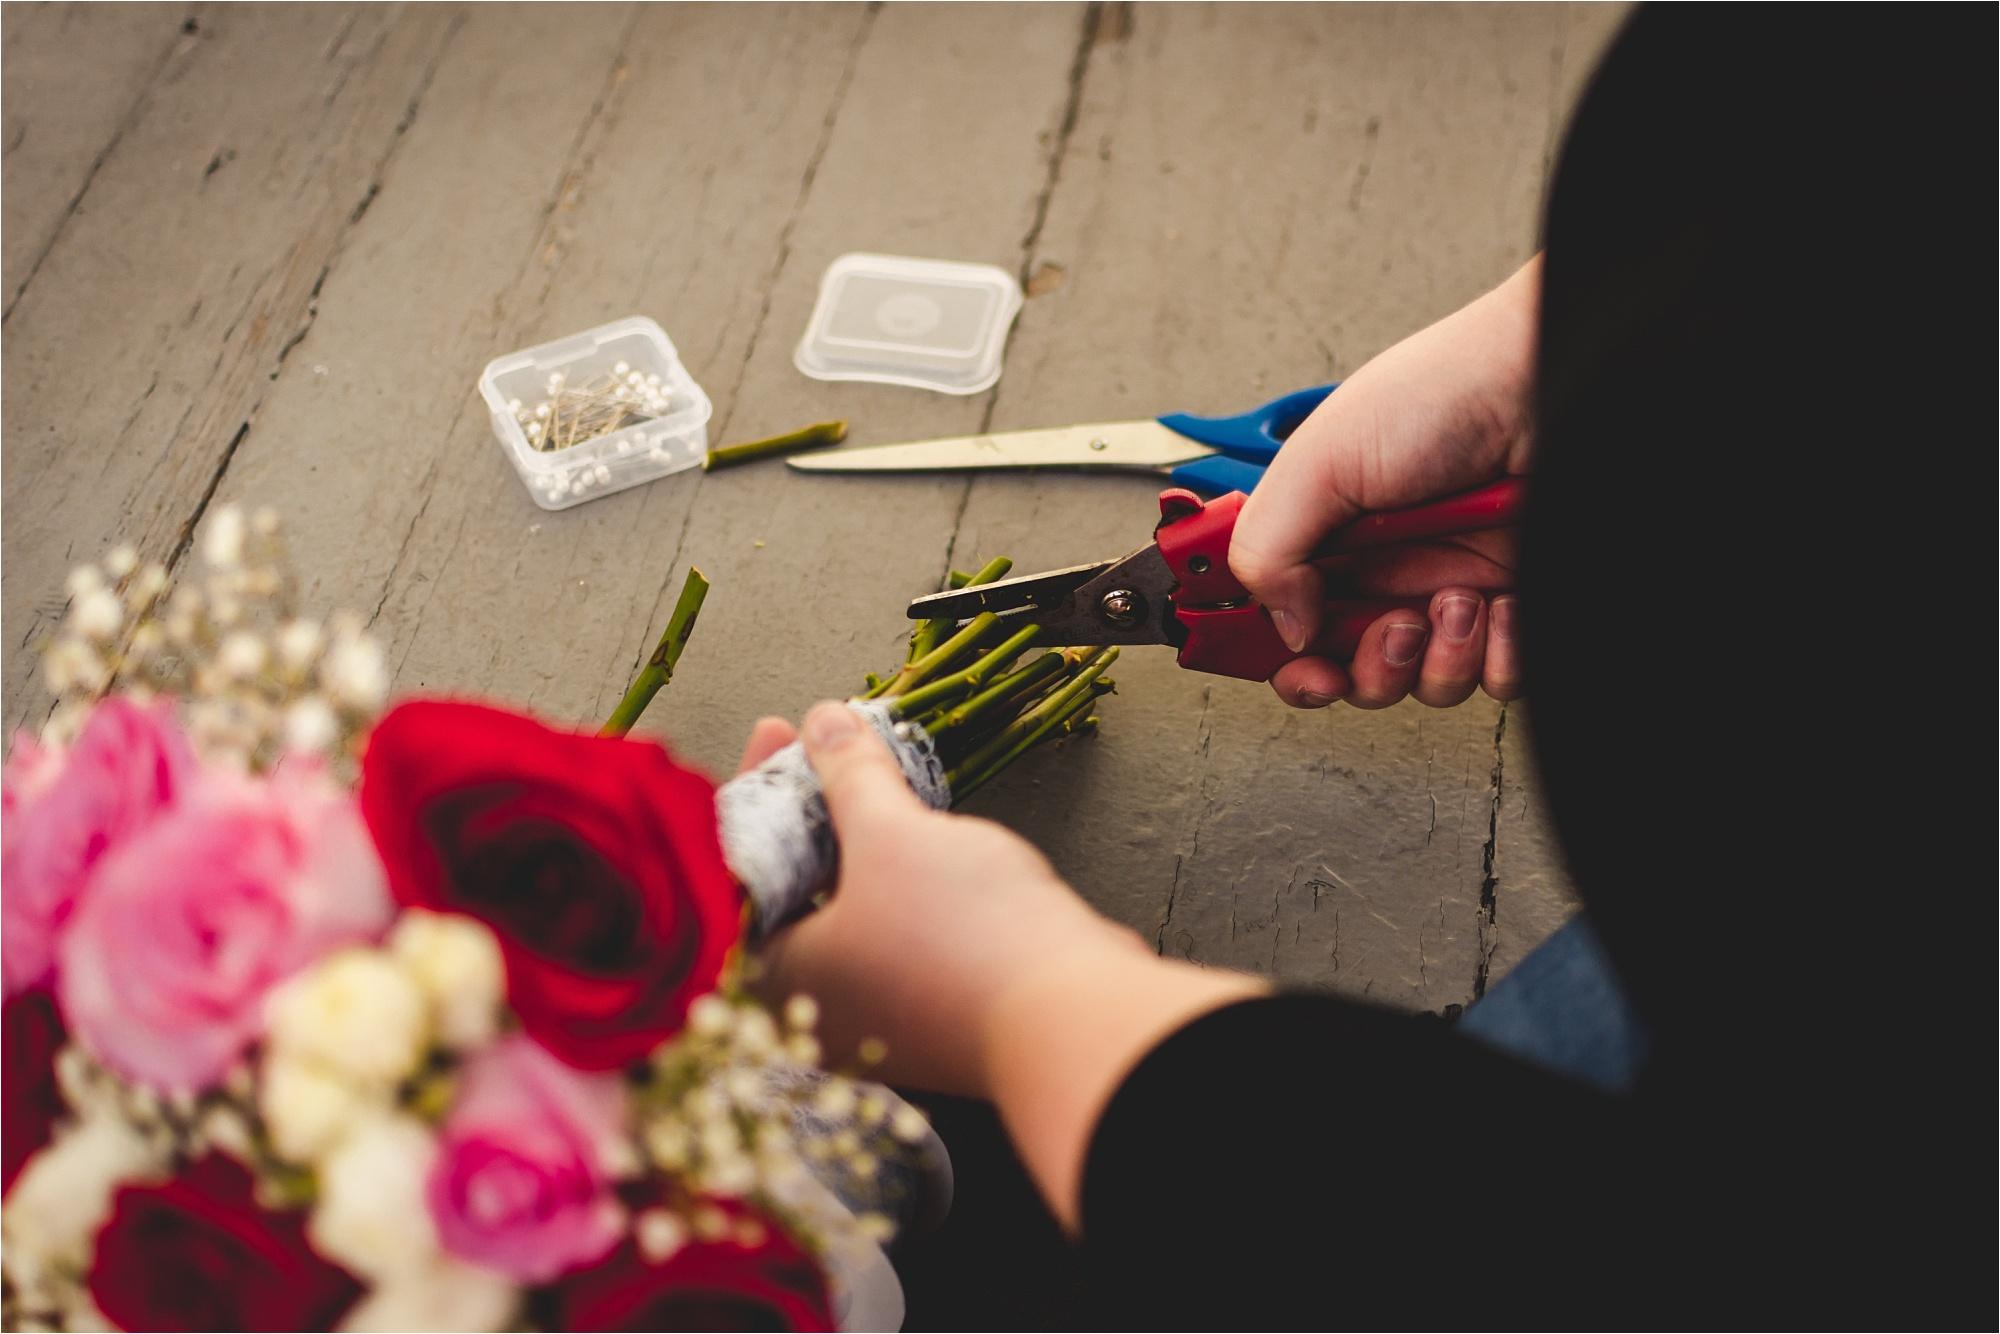 brittney-nestle-photo-roni-roses-floral-design.jpg